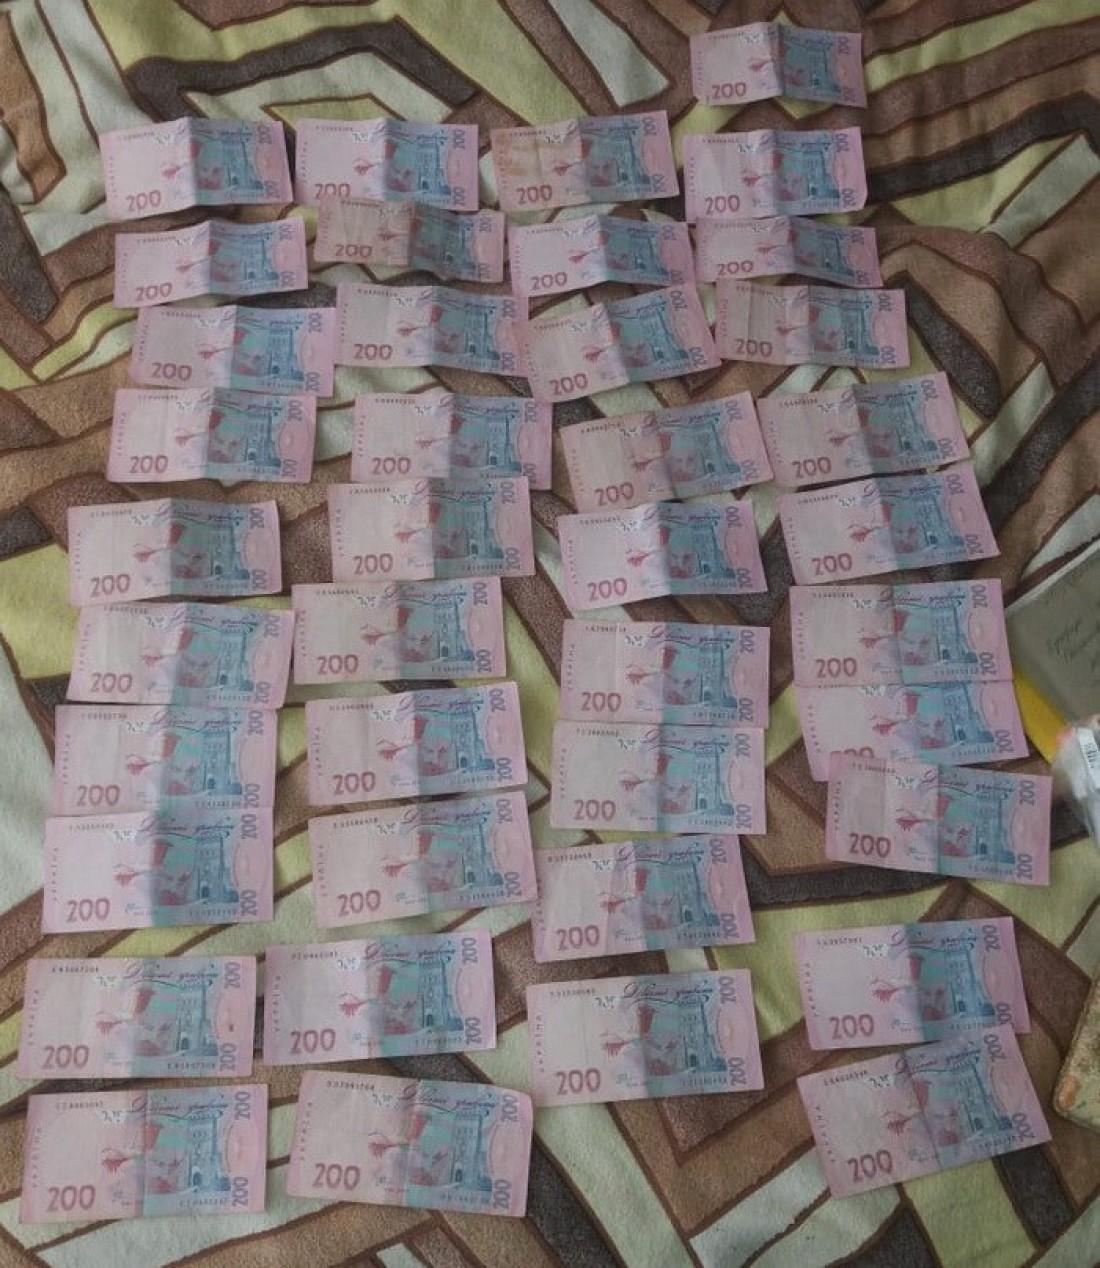 Прокурор получил взятку в размере 8 000 гривен